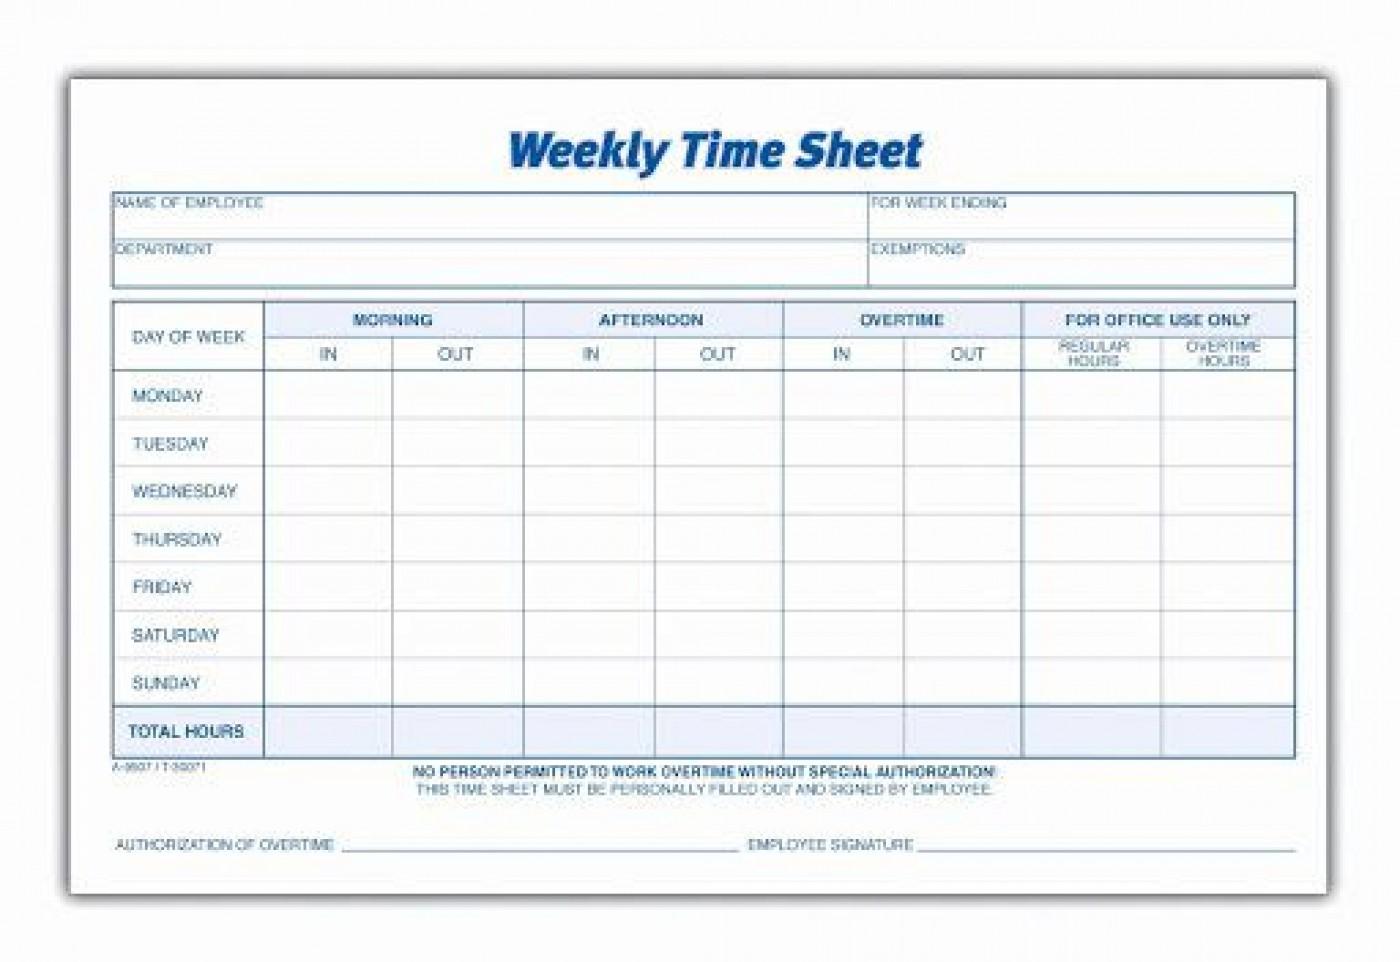 010 Phenomenal Free Employee Sign In Sheet Template Idea  Schedule Pdf Weekly Timesheet Printable1400